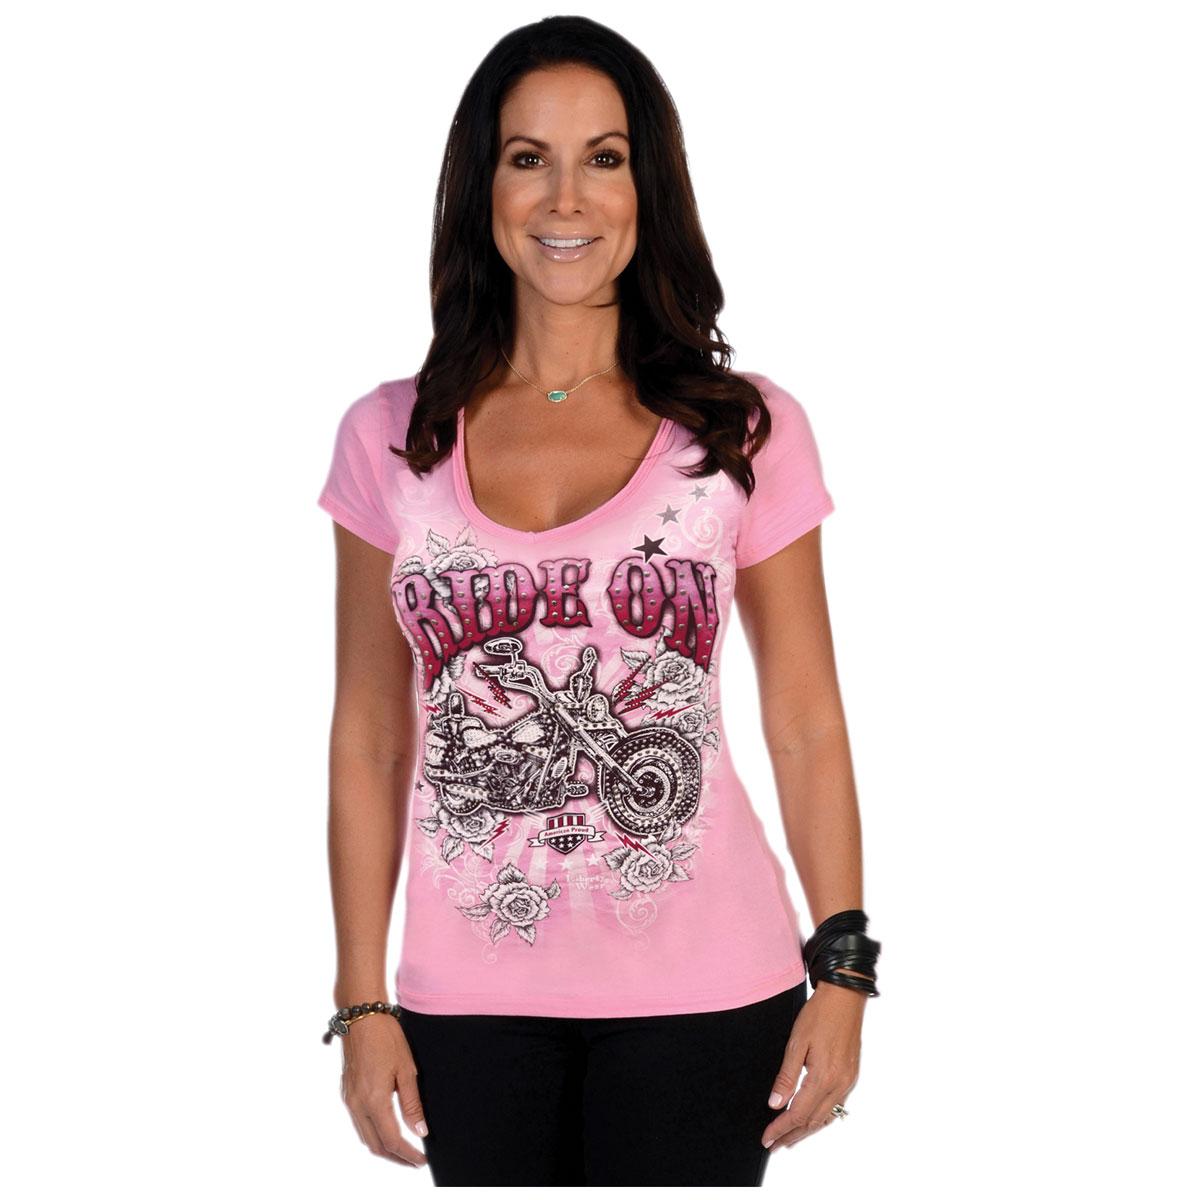 Liberty Wear Women's Ride On Free 2 Pink Tee